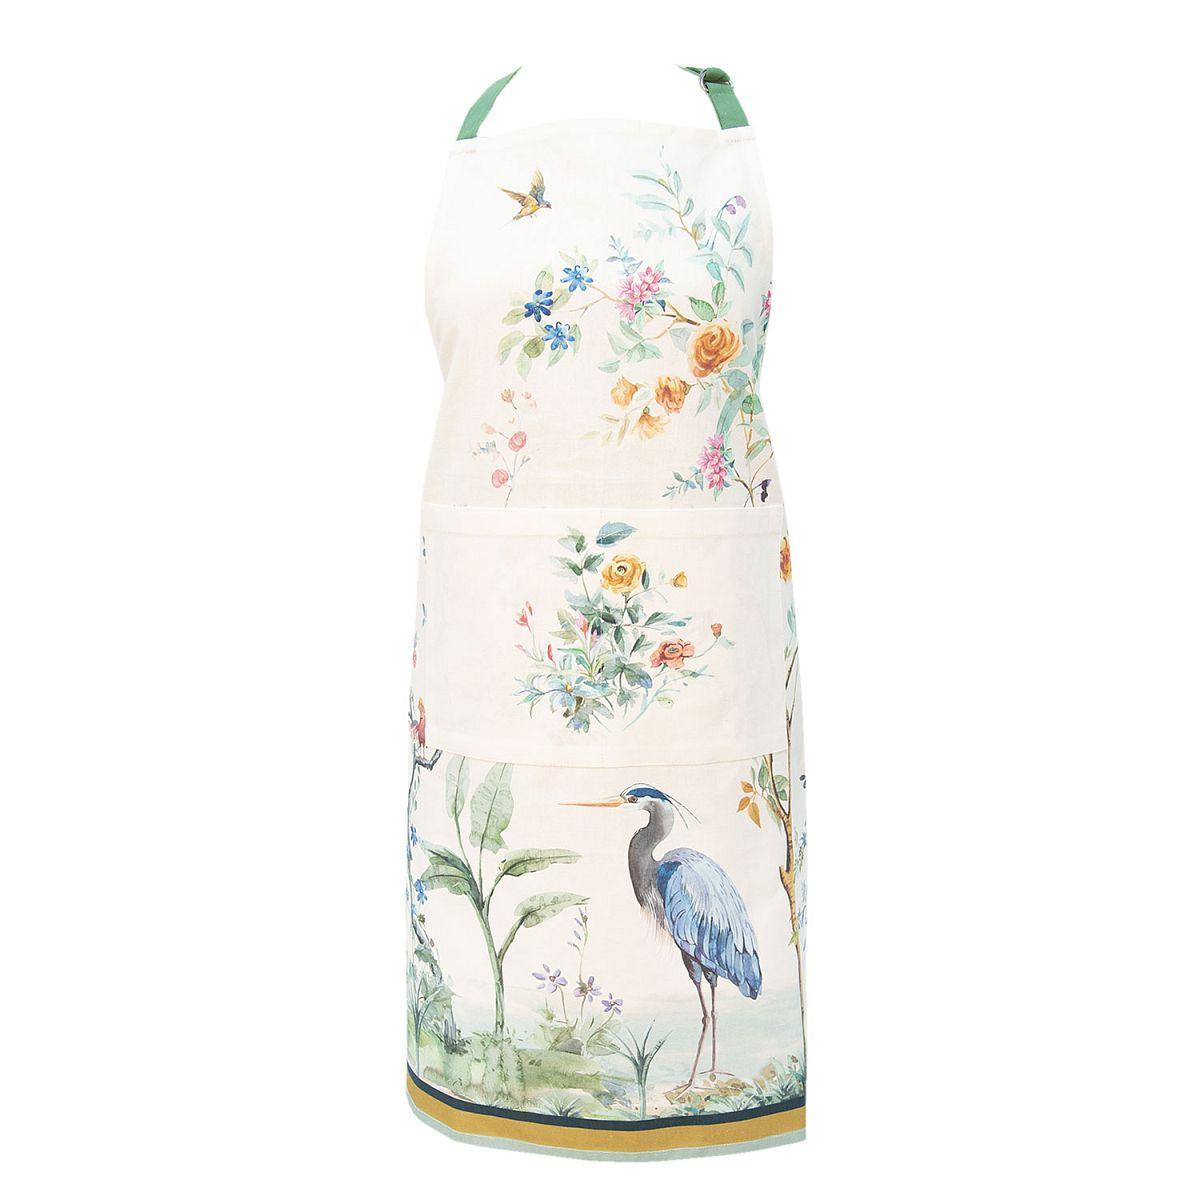 Kuchyňská zástěra BIRDS IN PARADISE 70*85 cm